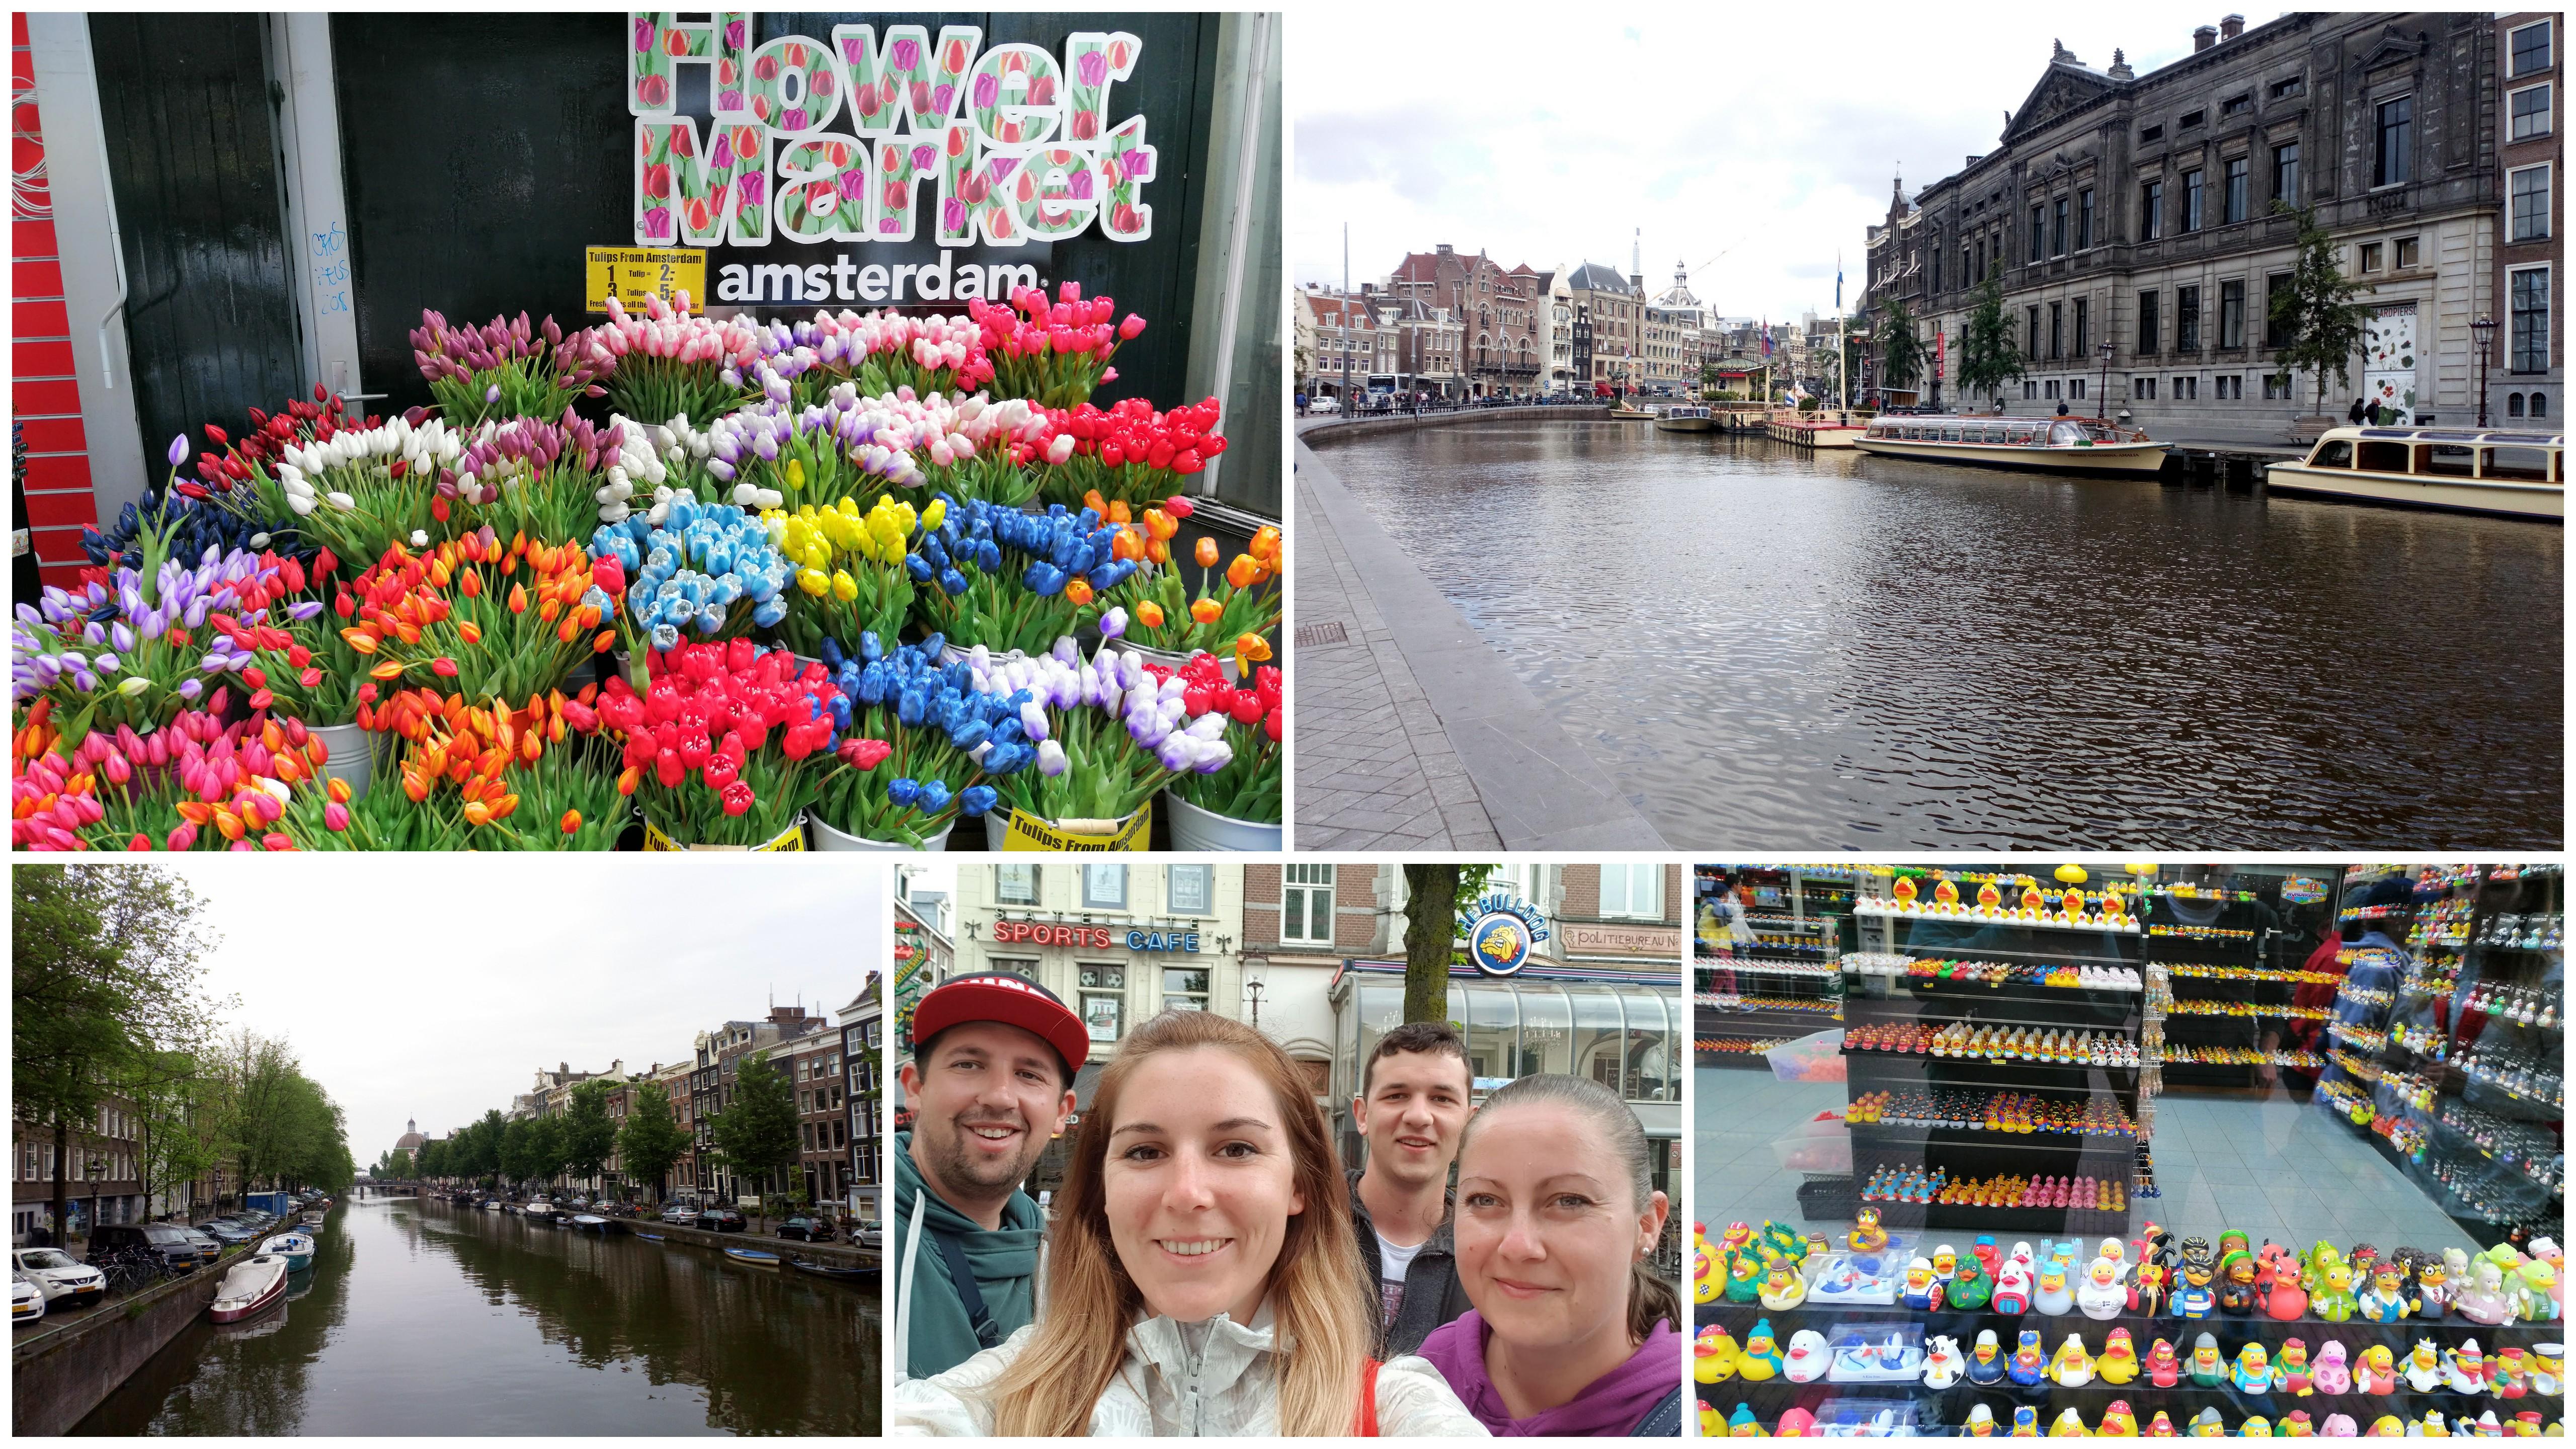 4_amszterdam.jpg